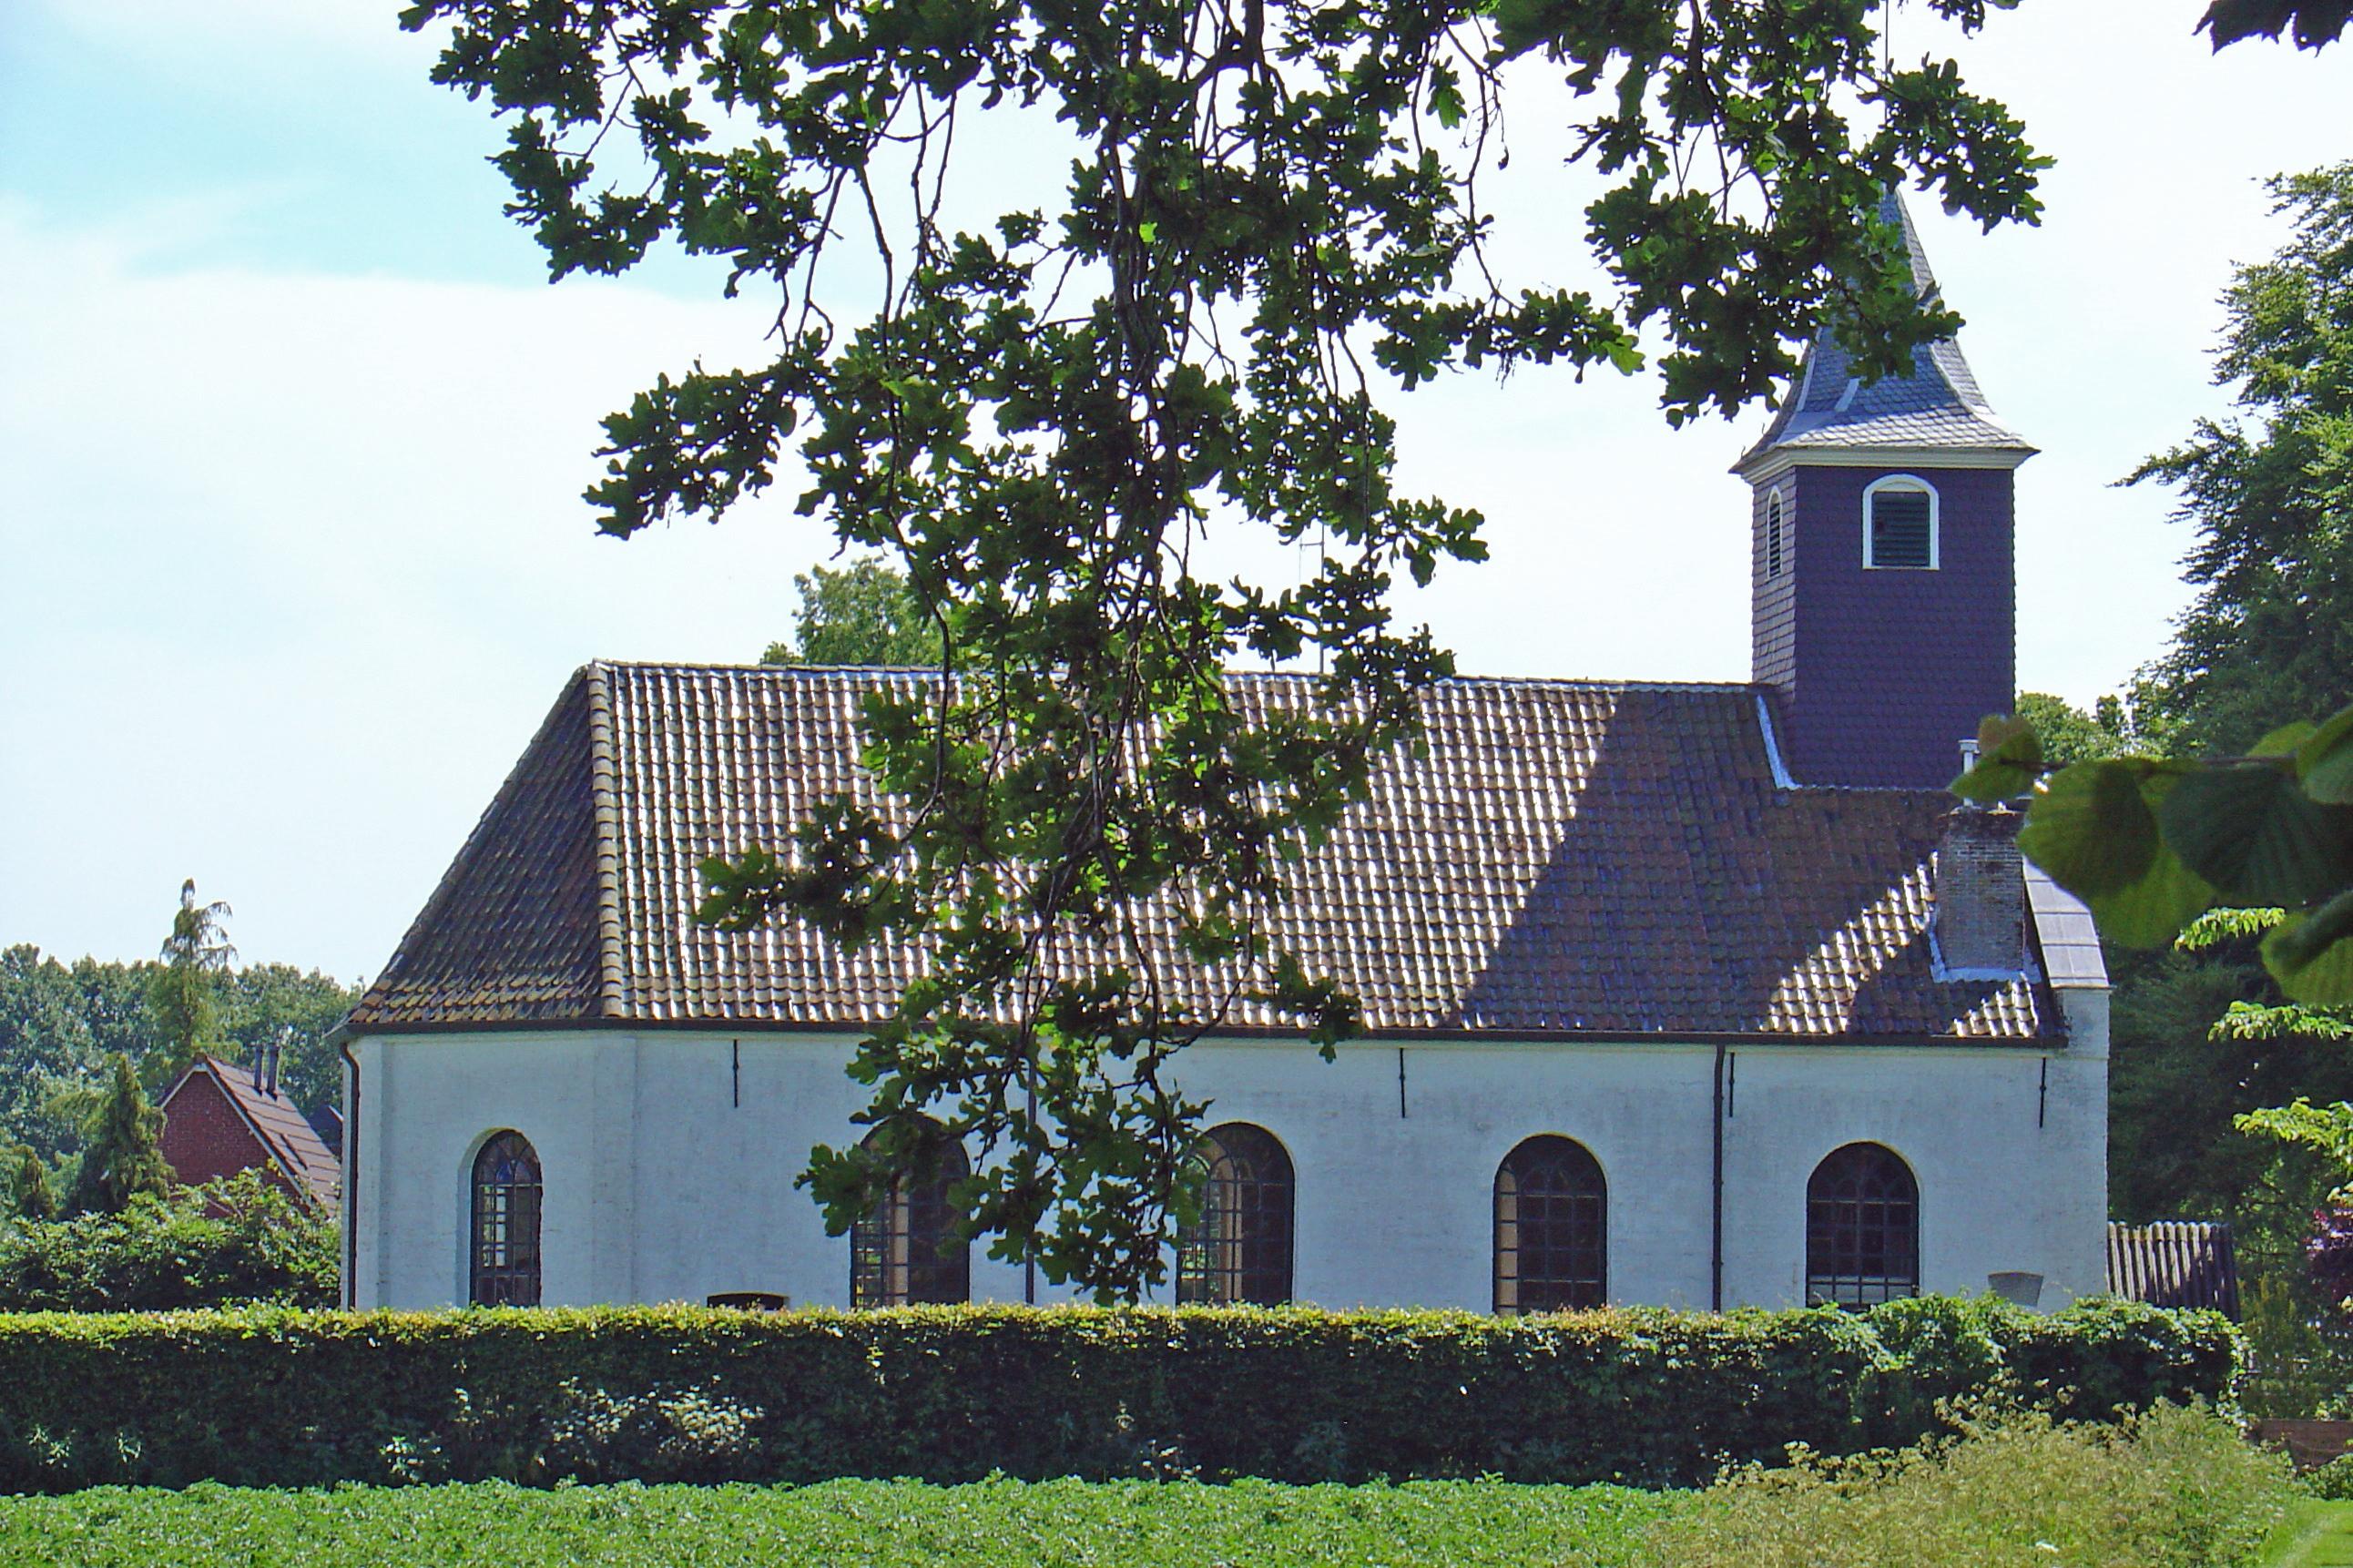 Onze-Lieve-Vrouwekerk (Gasselte)